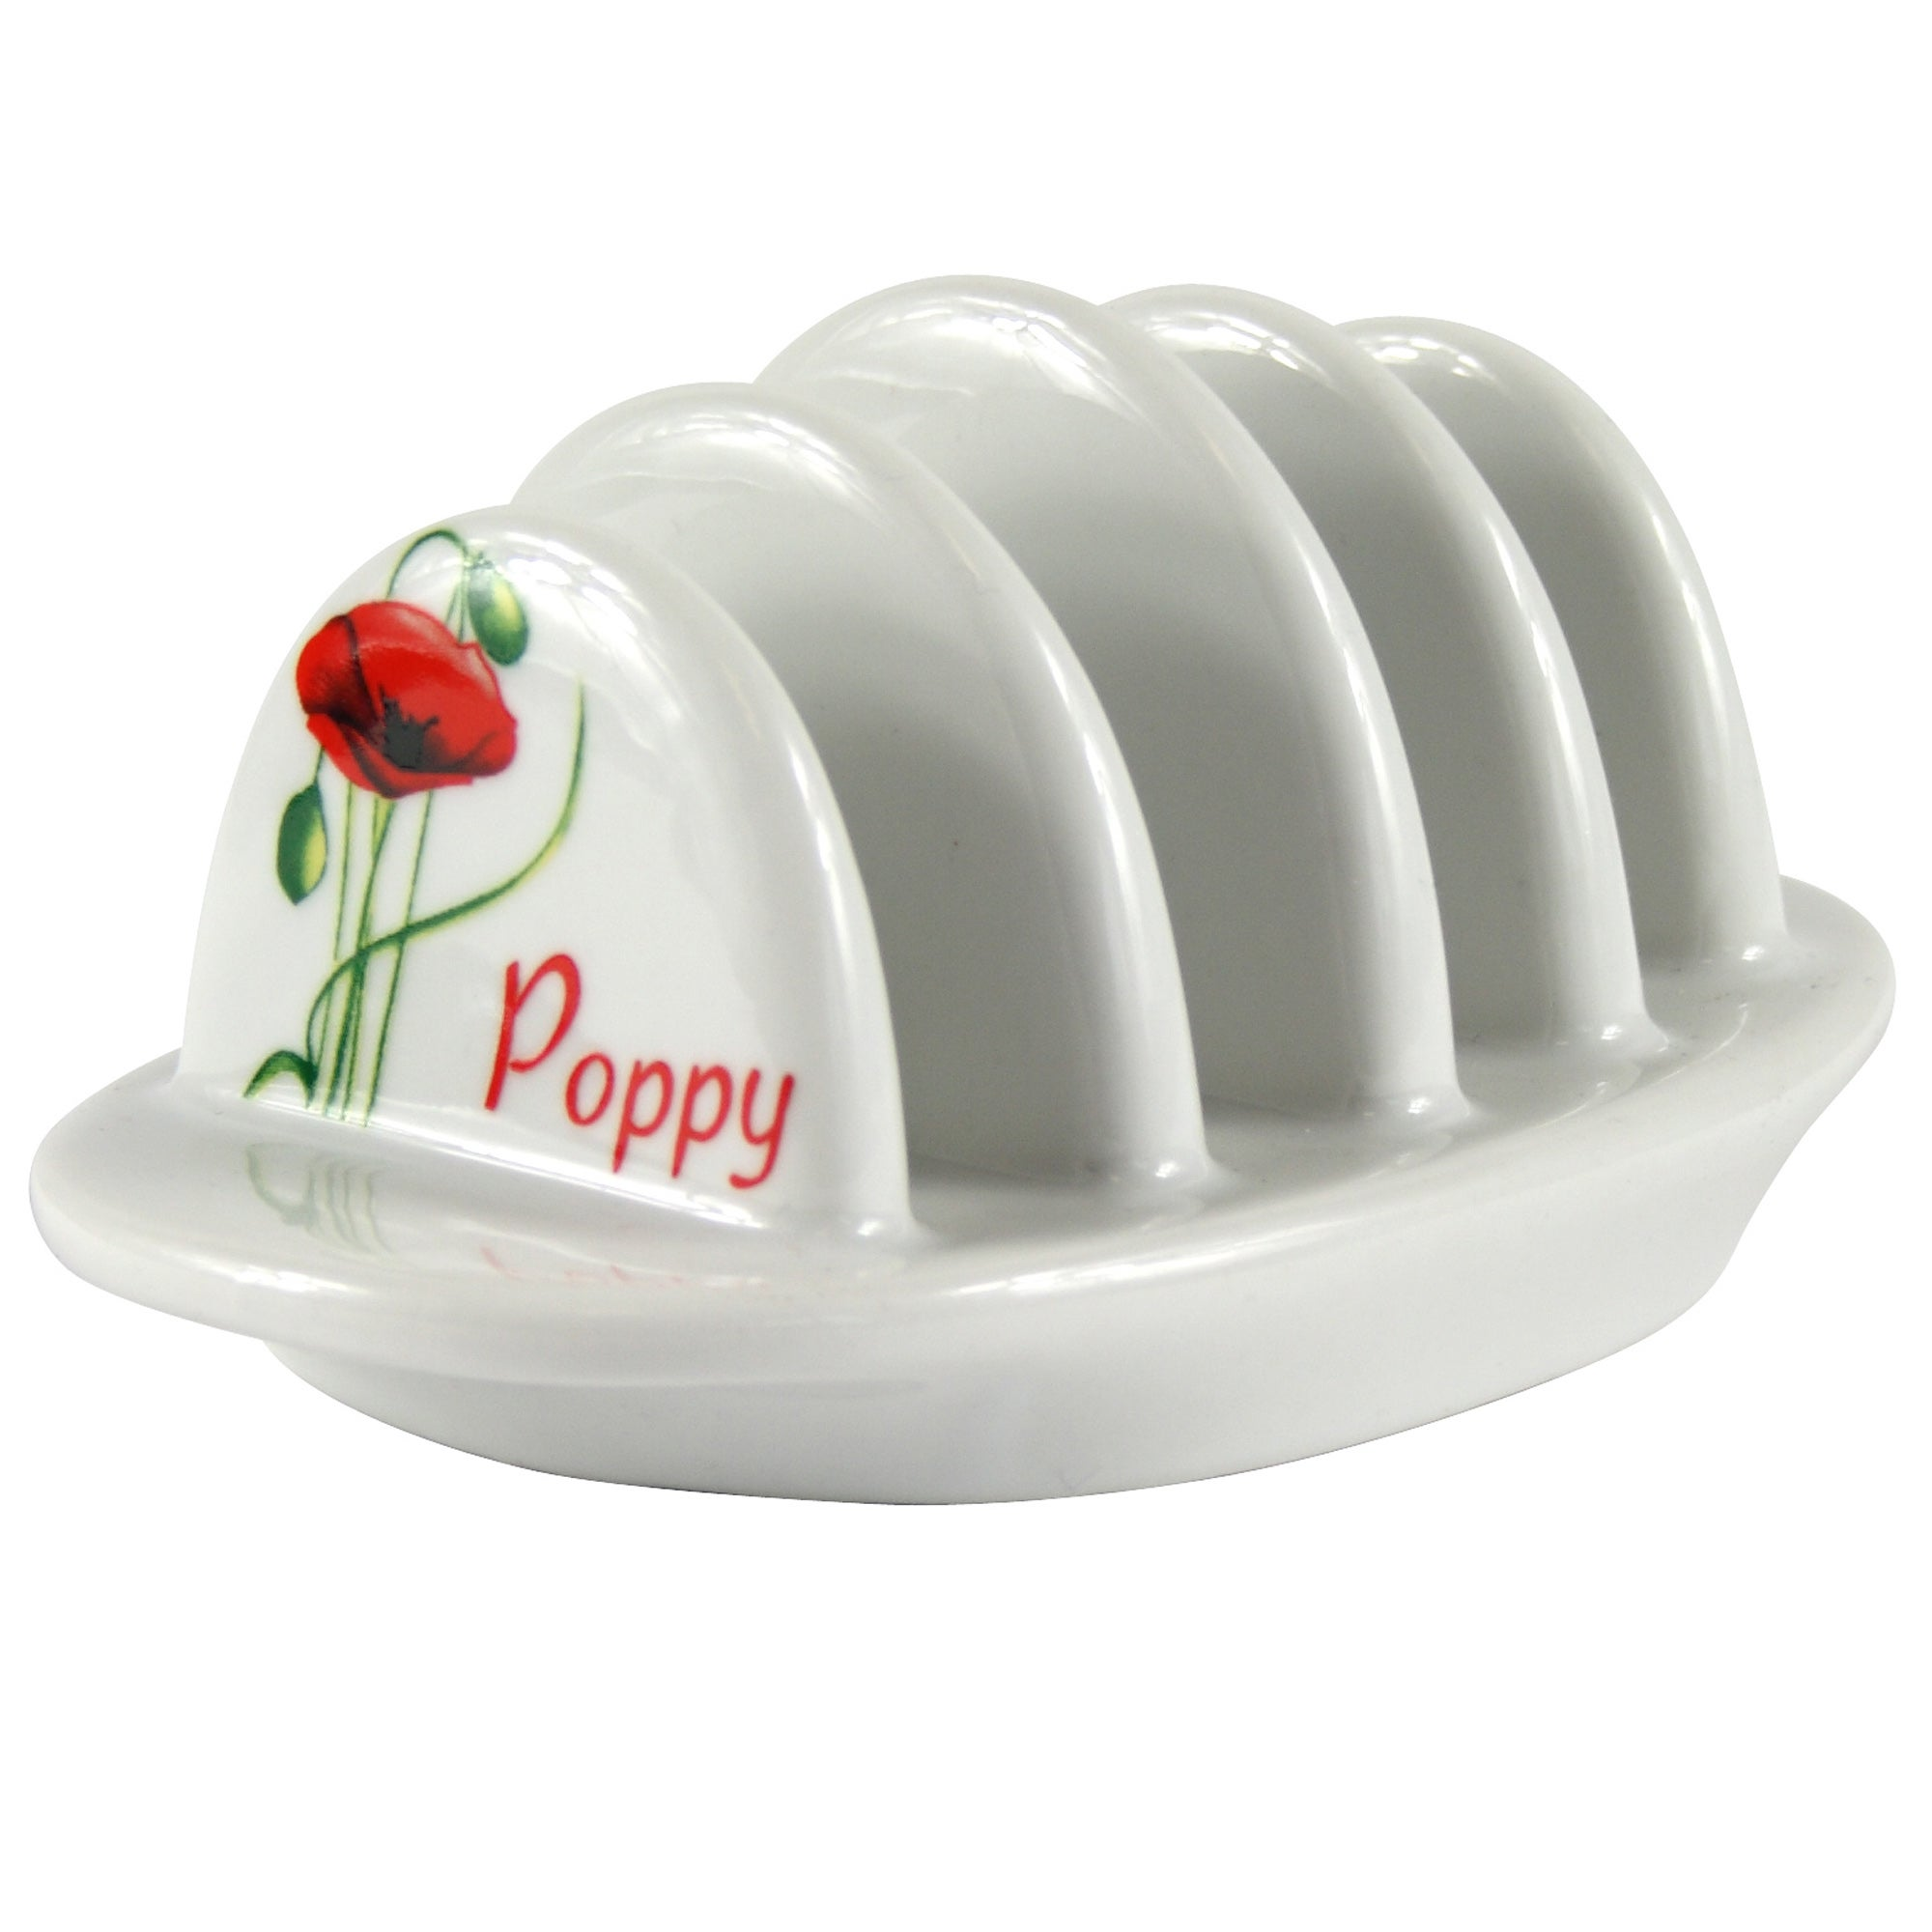 Poppy Collection Toast Rack